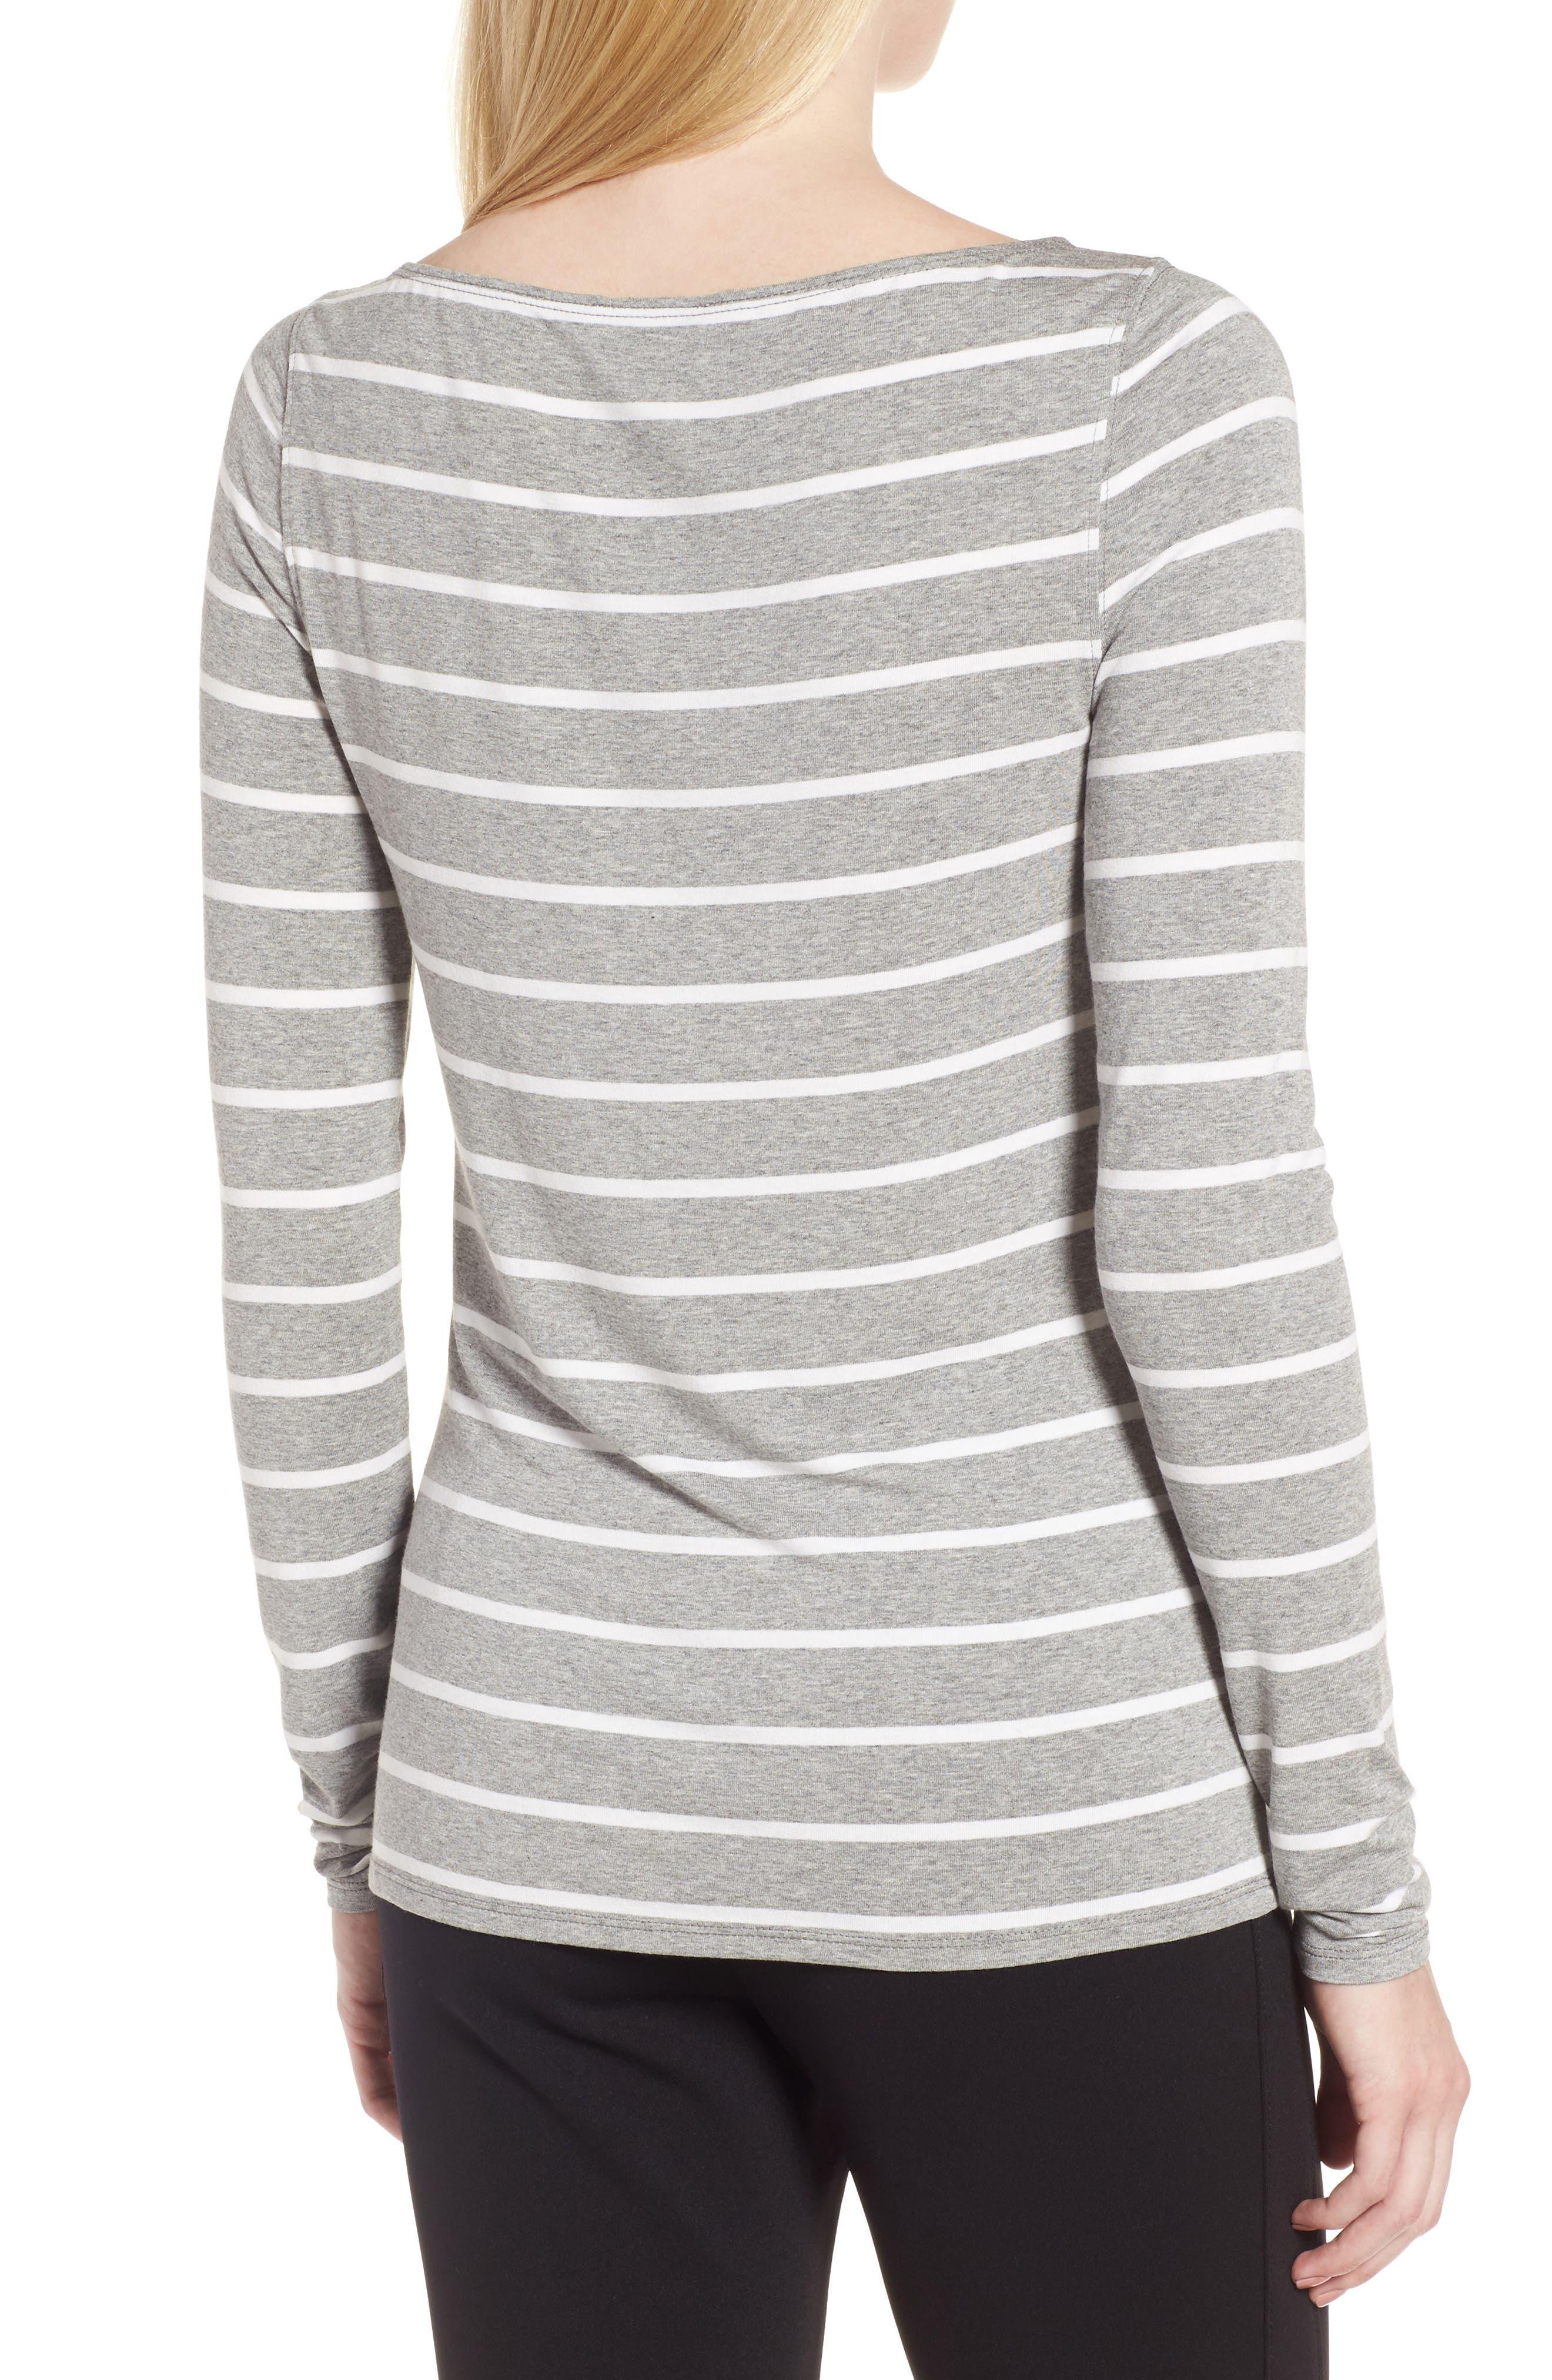 Long Sleeve Bateau Neck Tee,                             Alternate thumbnail 2, color,                             Grey Heather- Ivory Stripe